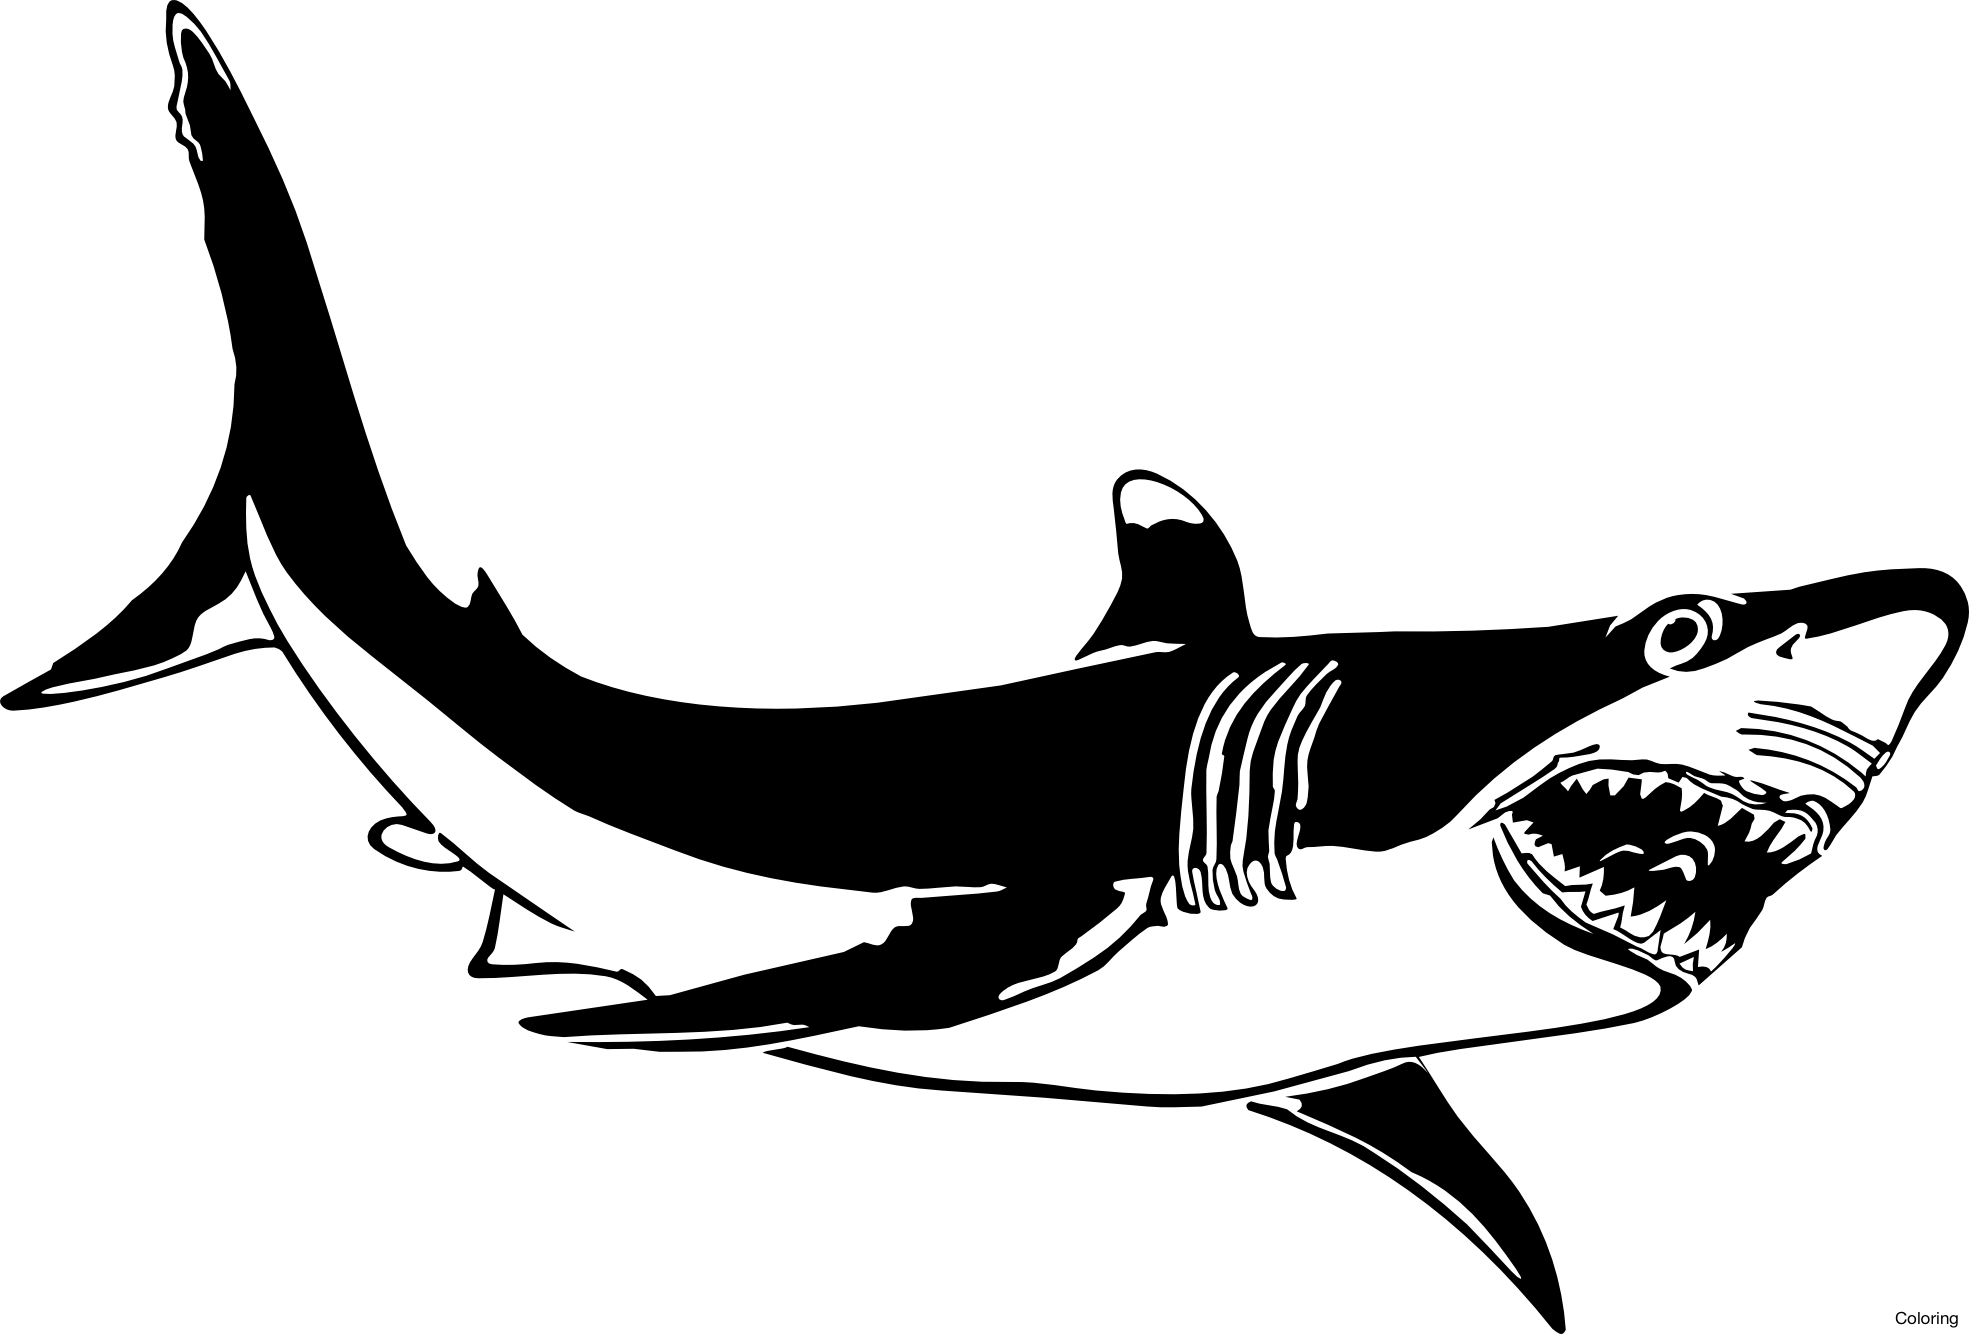 Clipart shark bull shark. Great white isurus oxyrinchus